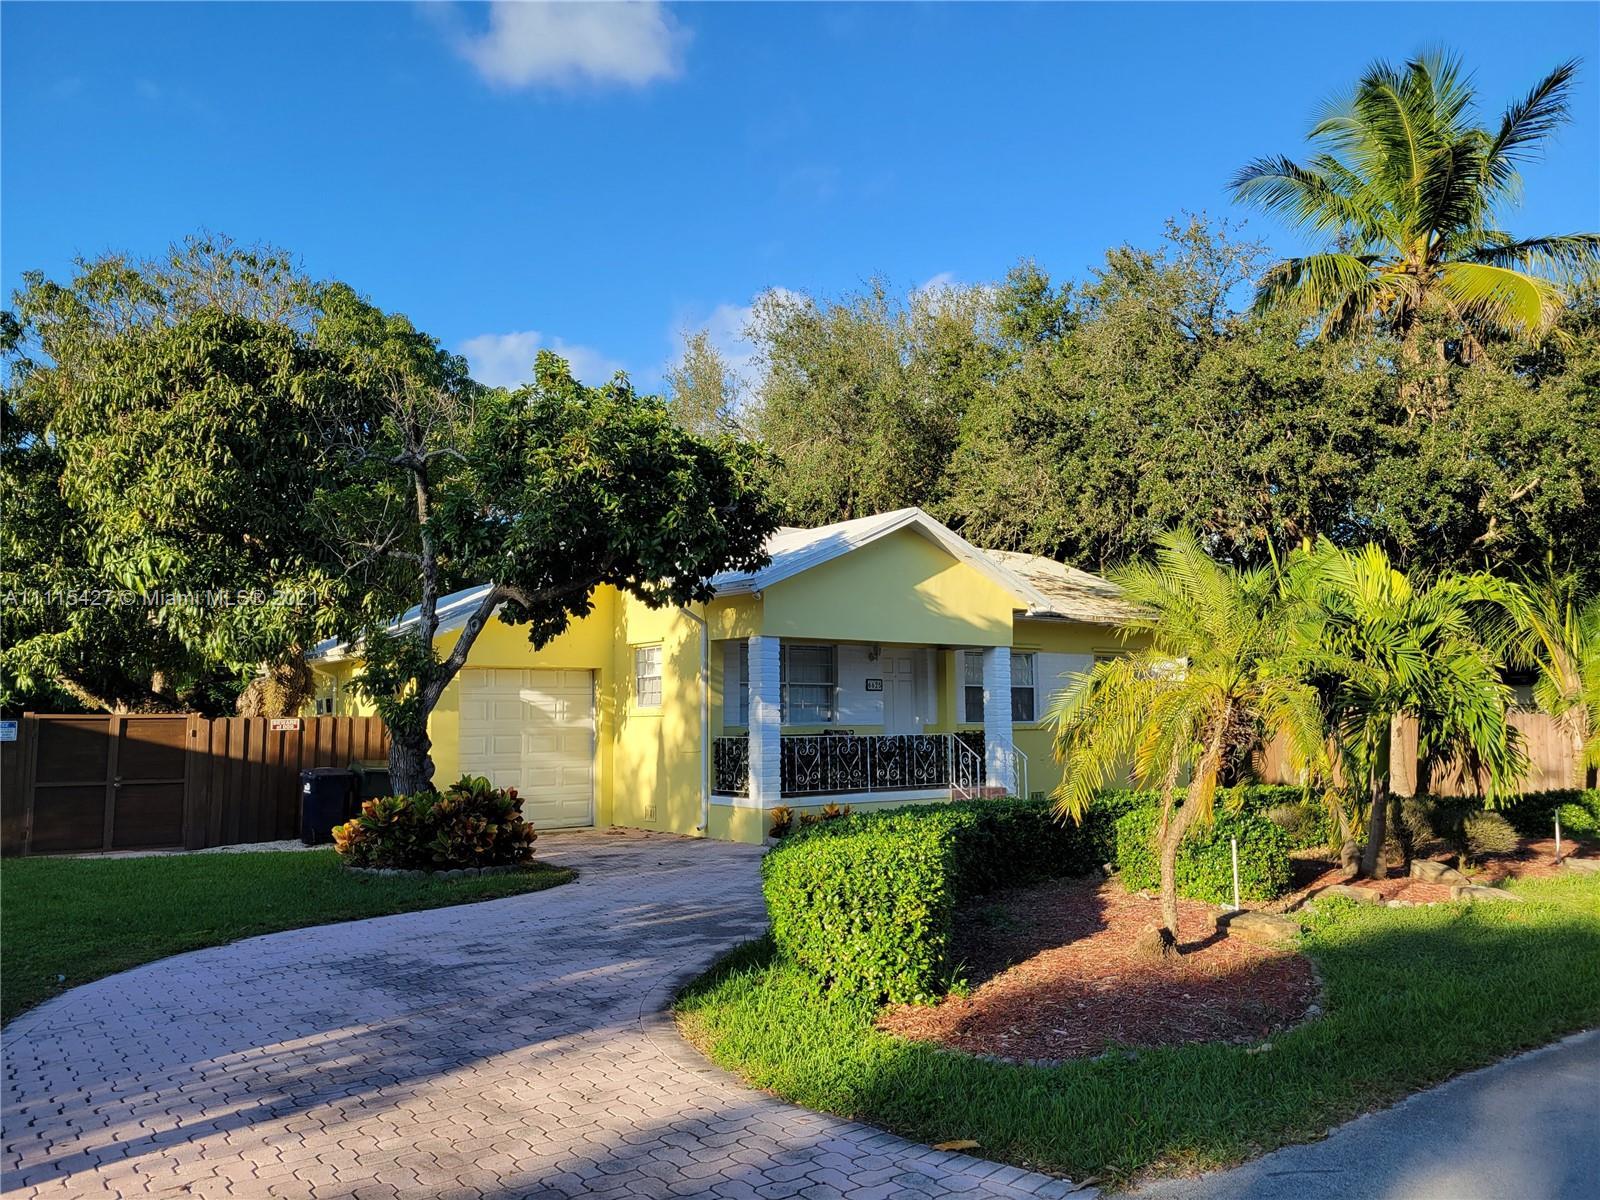 South Miami - 6625 SW 79th St, South Miami, FL 33143